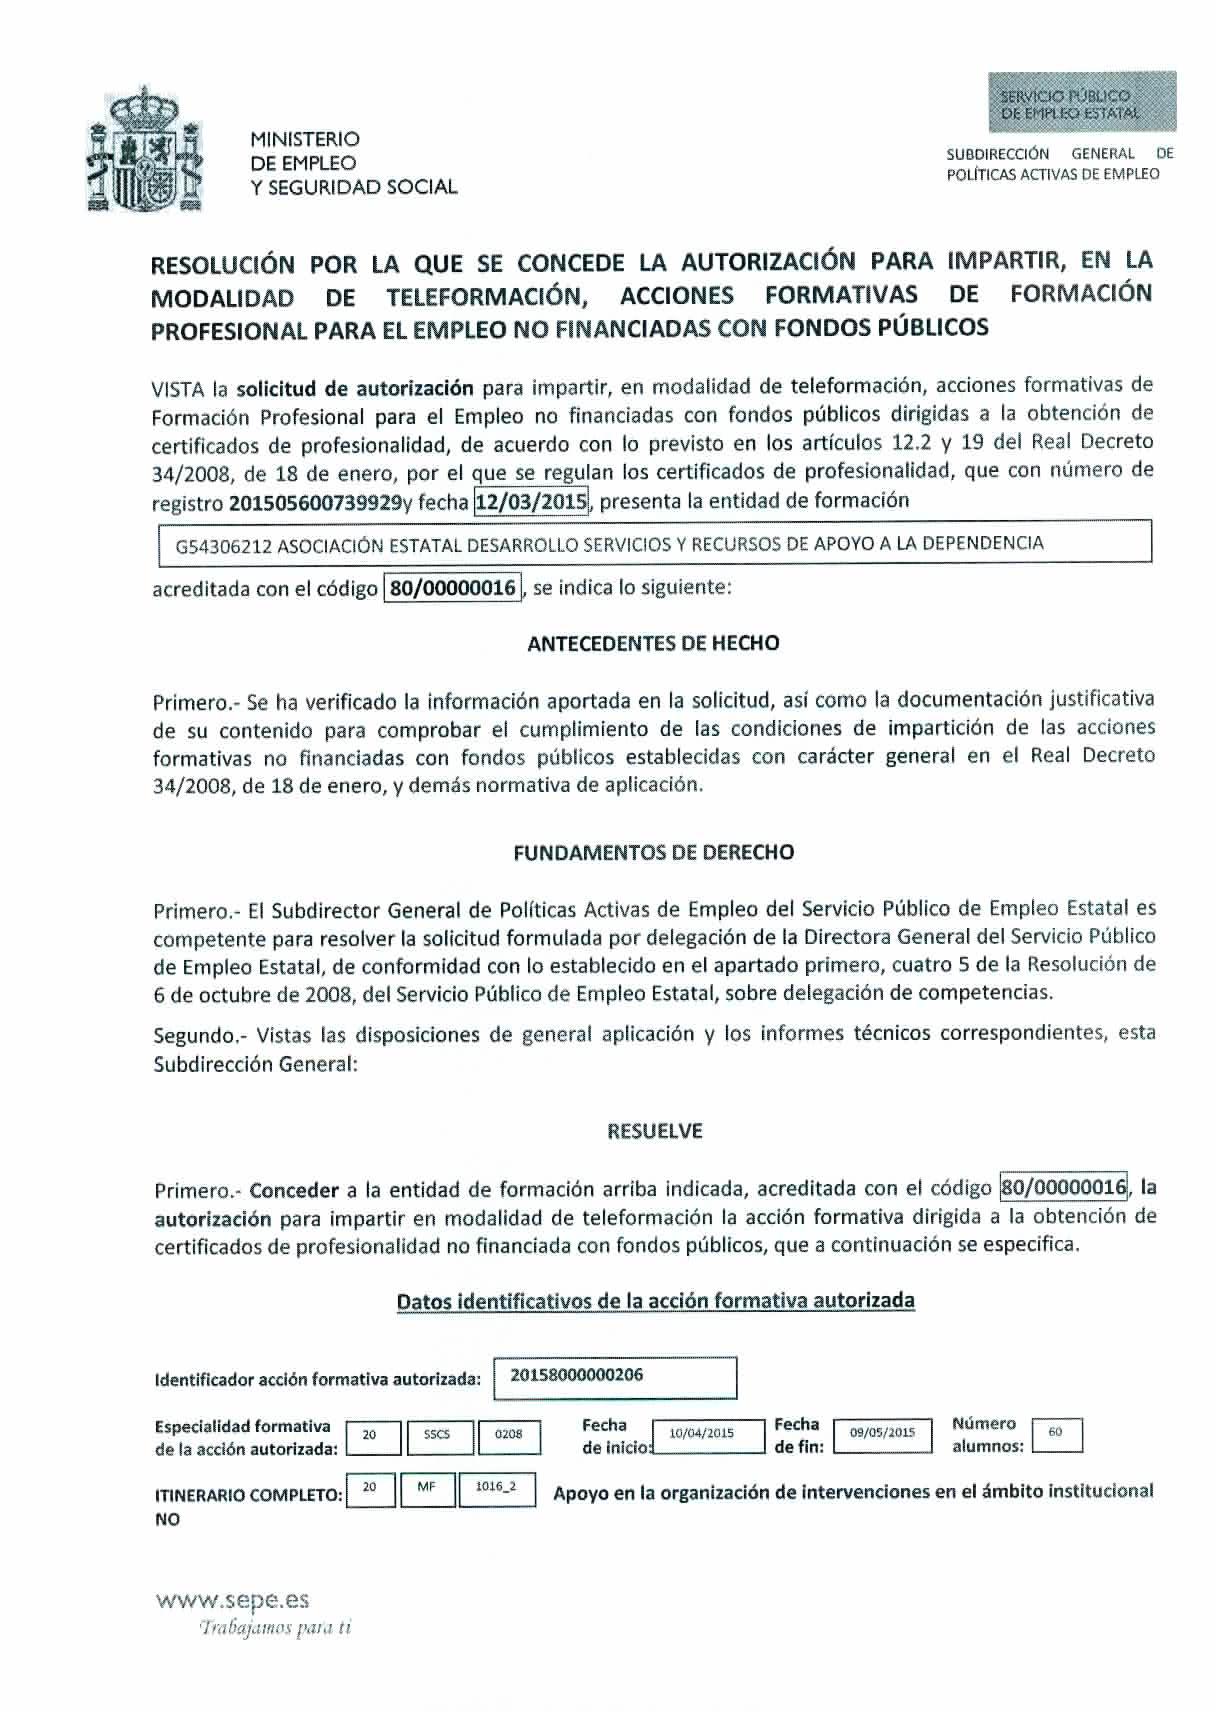 resolucion_sepe_autorizacion_SSCS0208_MF1016_2_Página_1